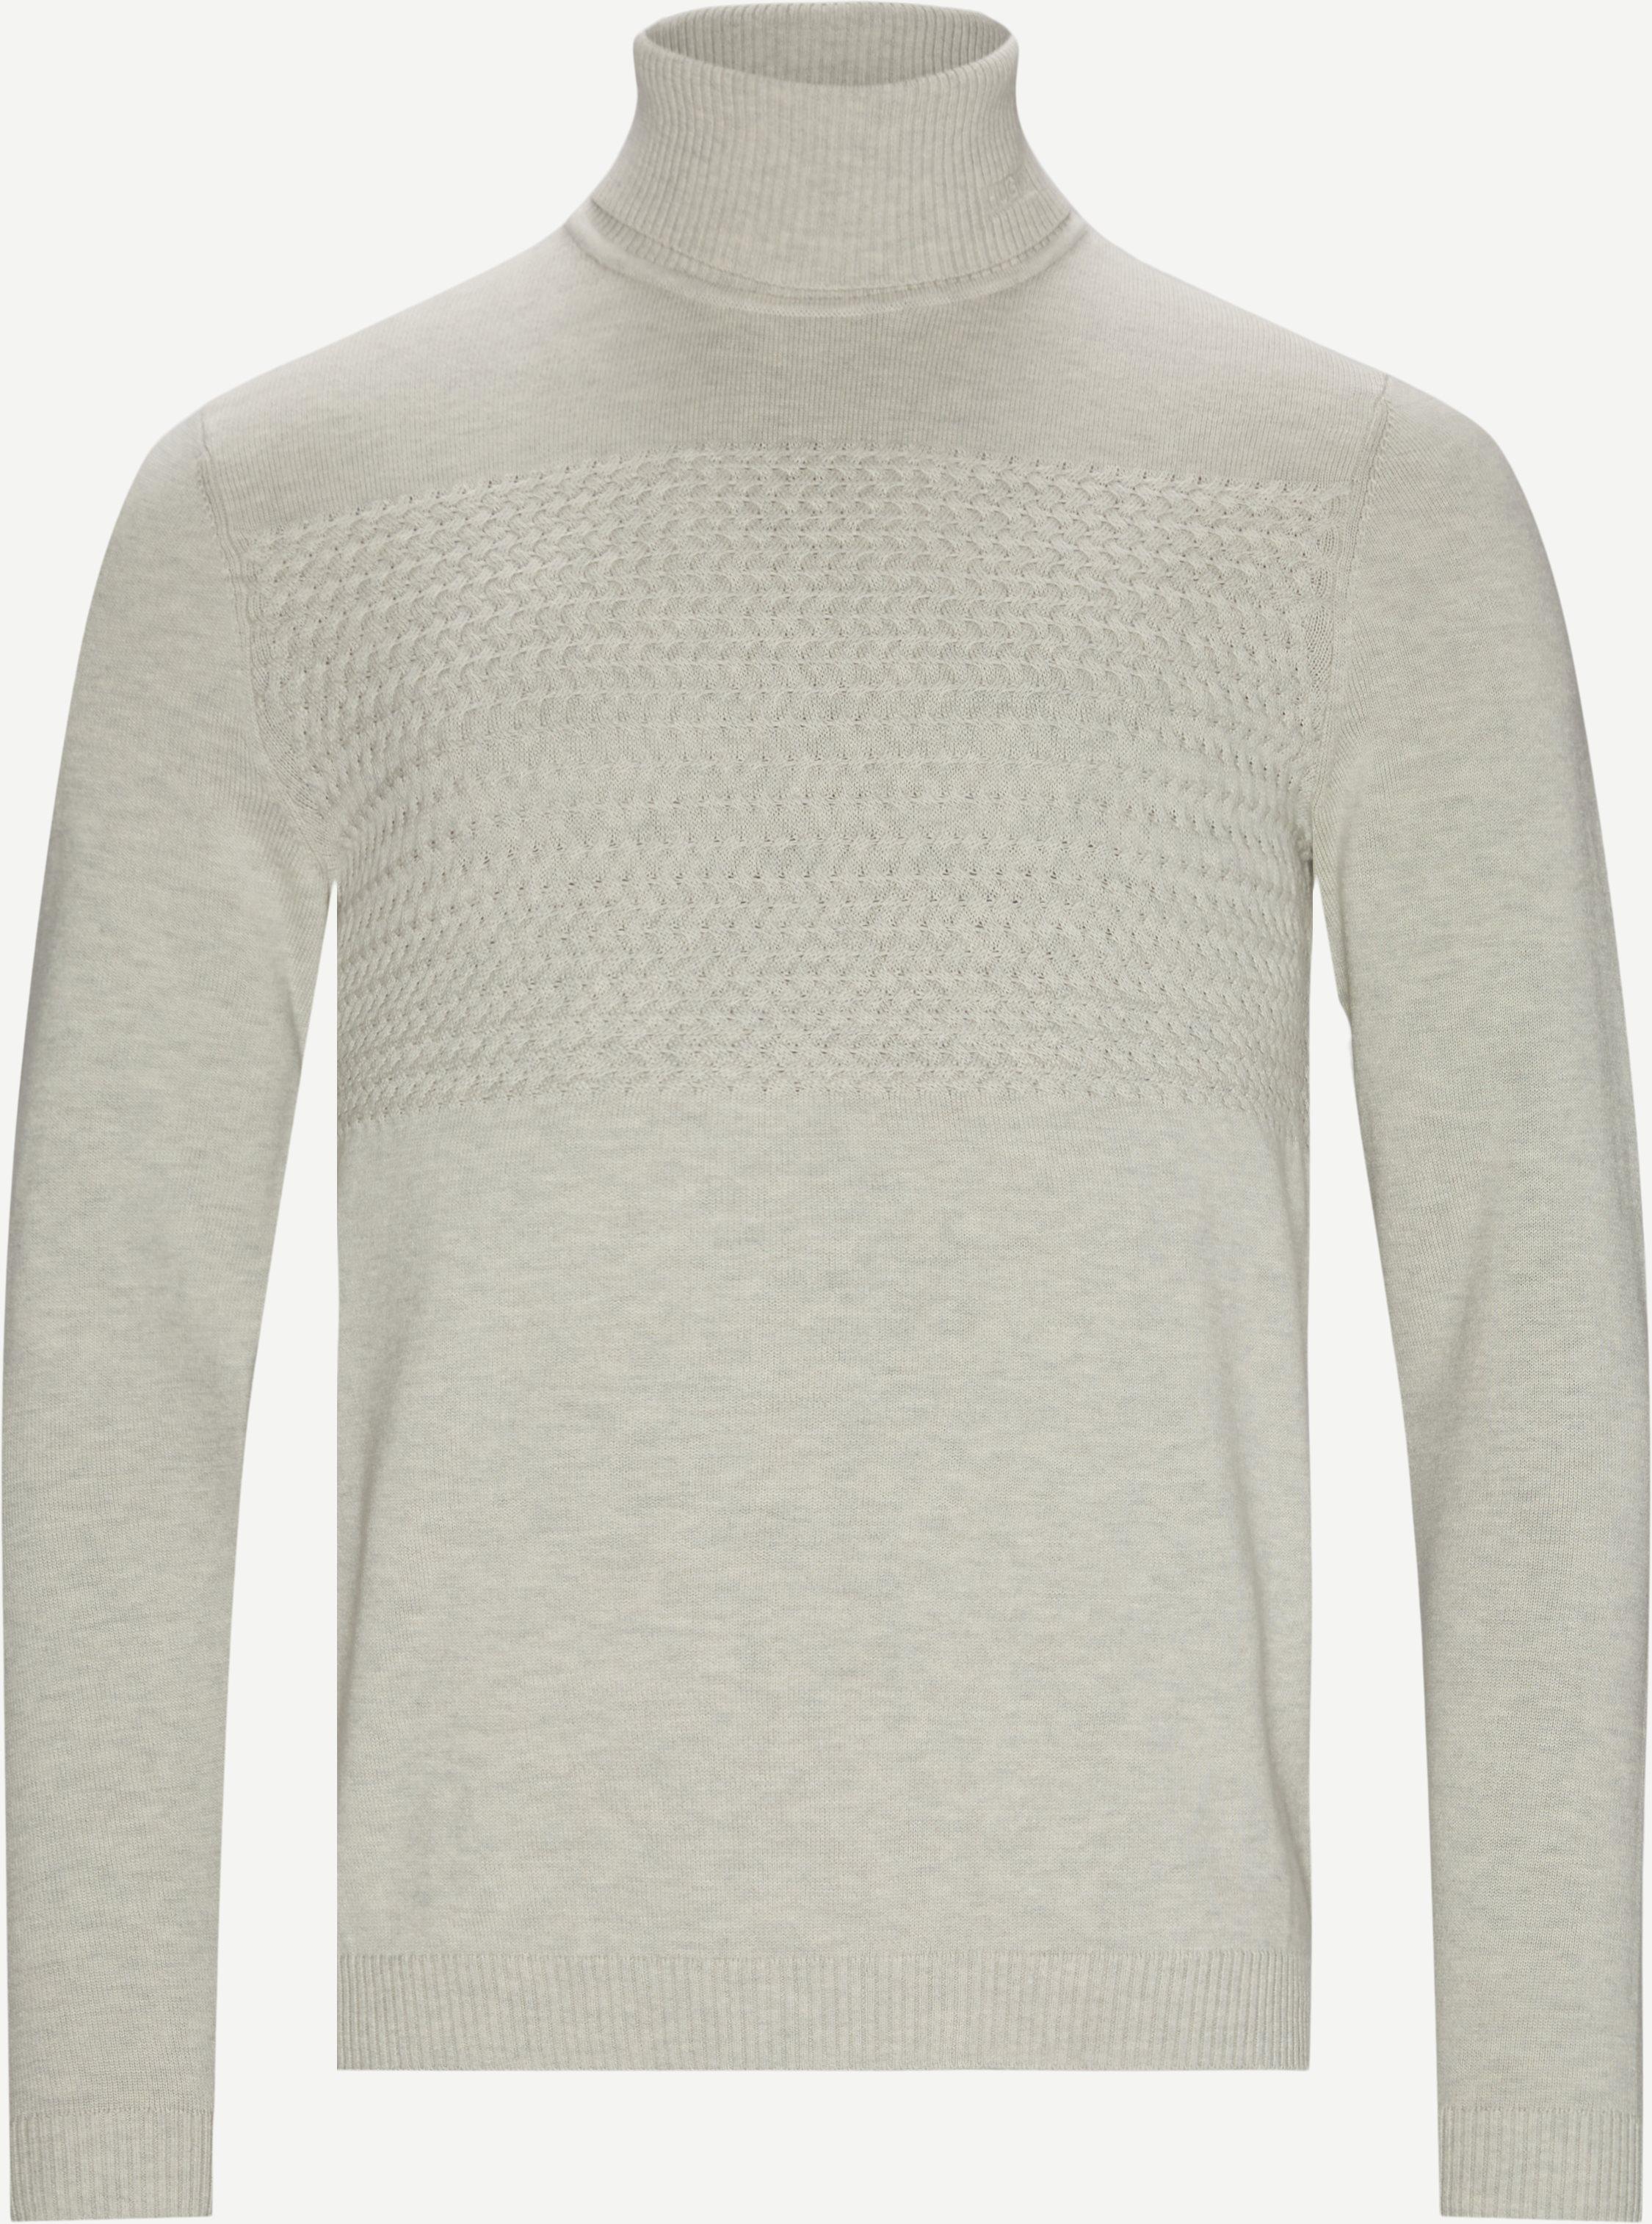 Knitwear - Regular fit - Sand